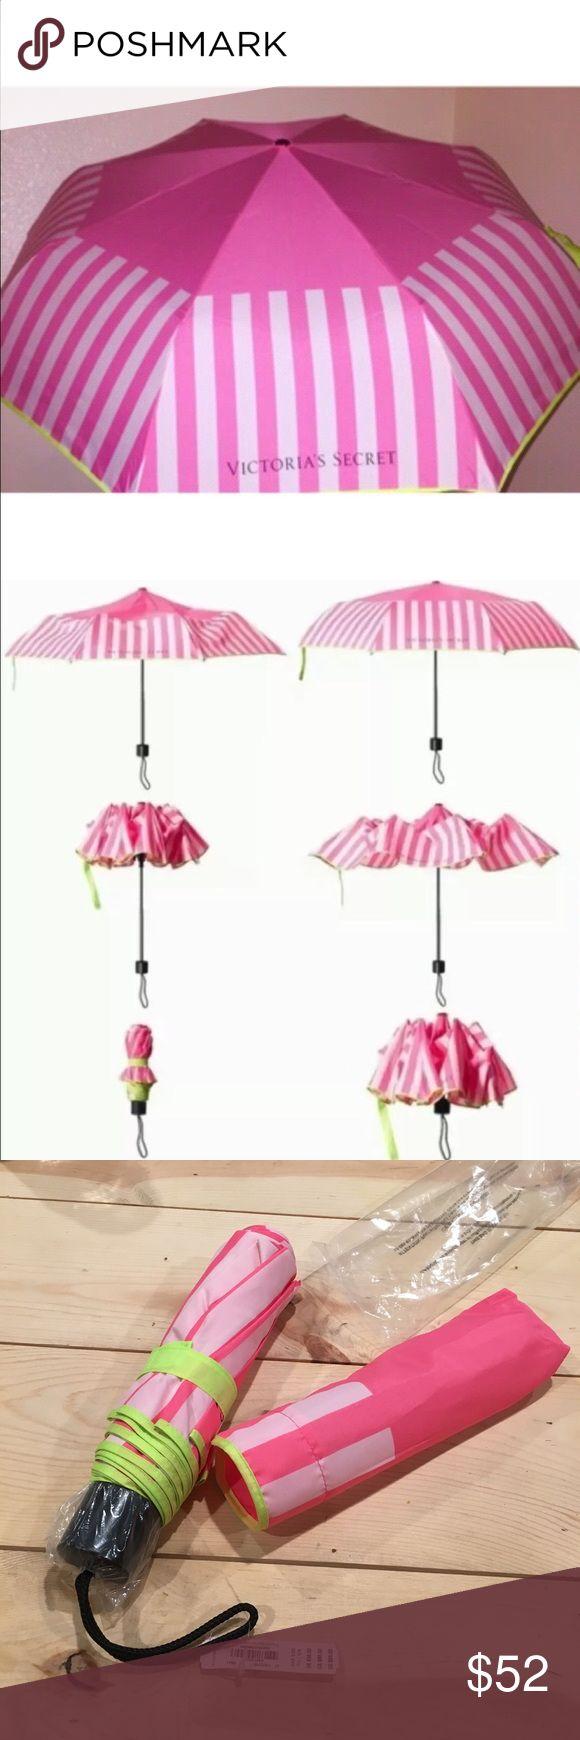 NWT Victoria's Secret umbrella Brand new light/dark pink striped compact umbrella with neon yellow trim, strap, and carrying case. Victoria's Secret Accessories Umbrellas